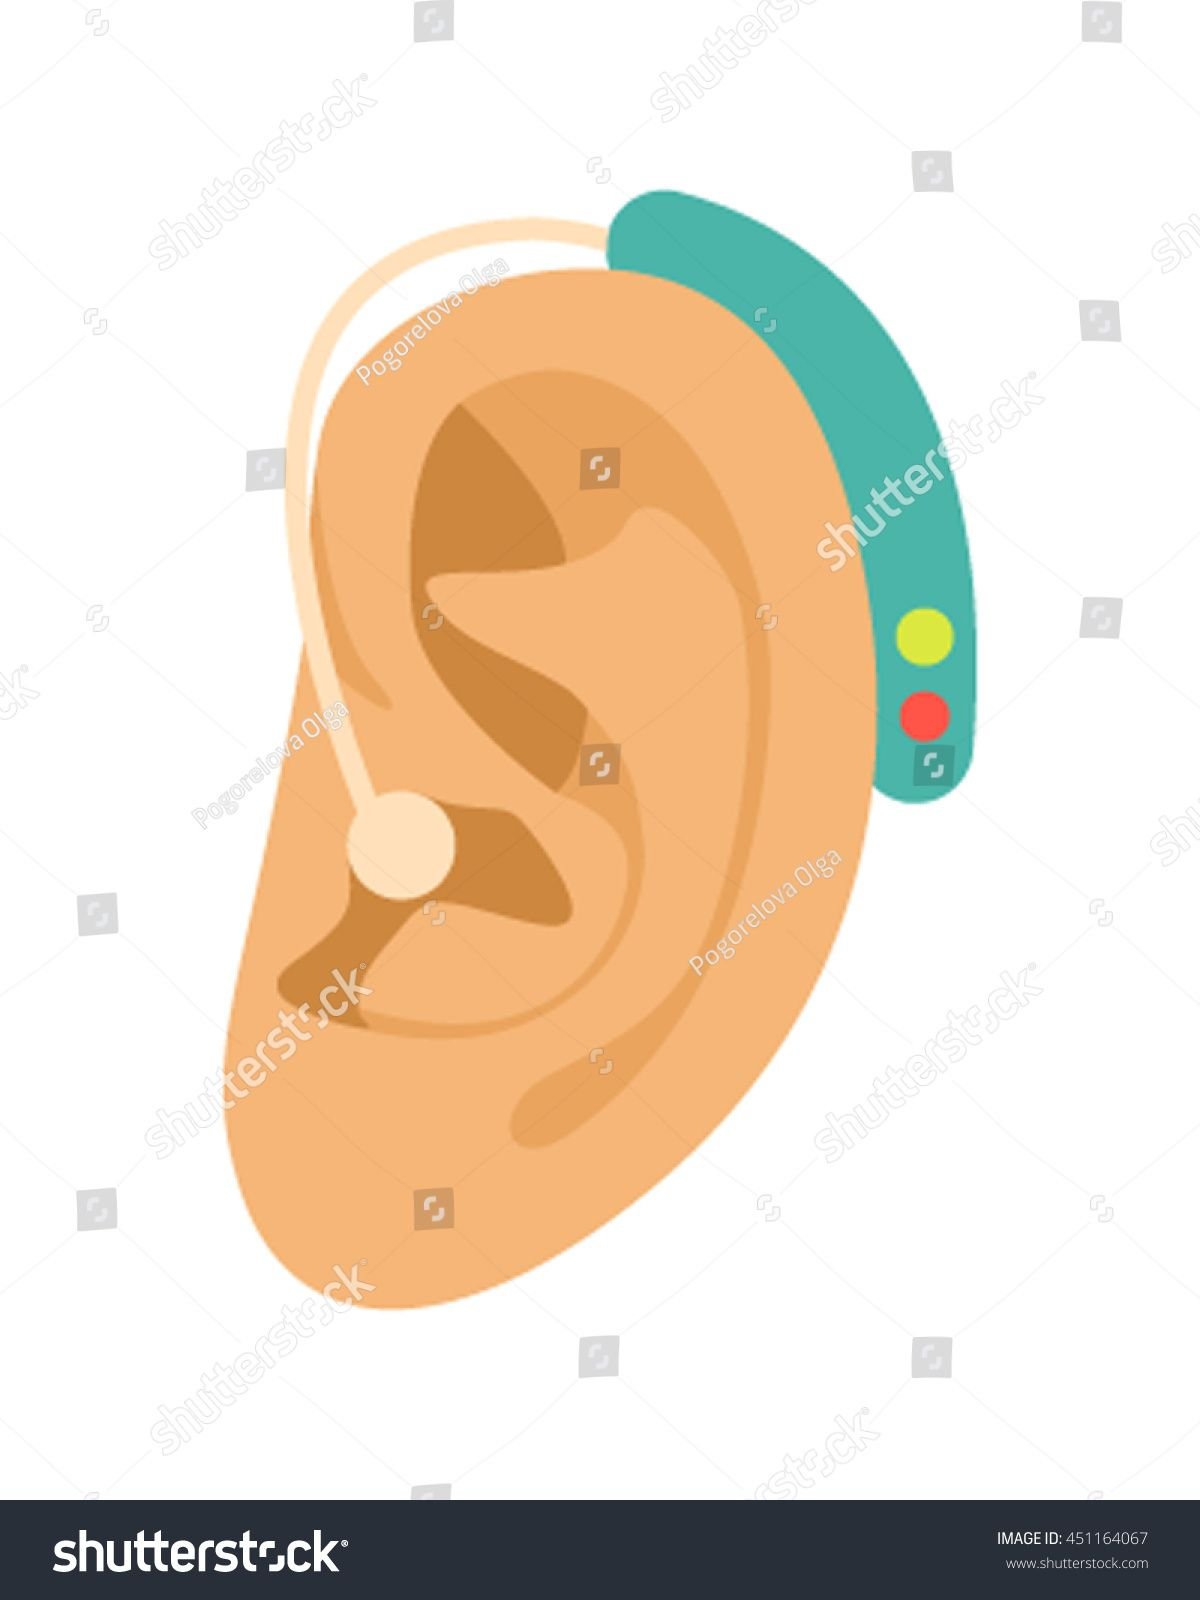 Ear Hearing Aid Icon Cartoon Style Stock Vector 451164067 Work